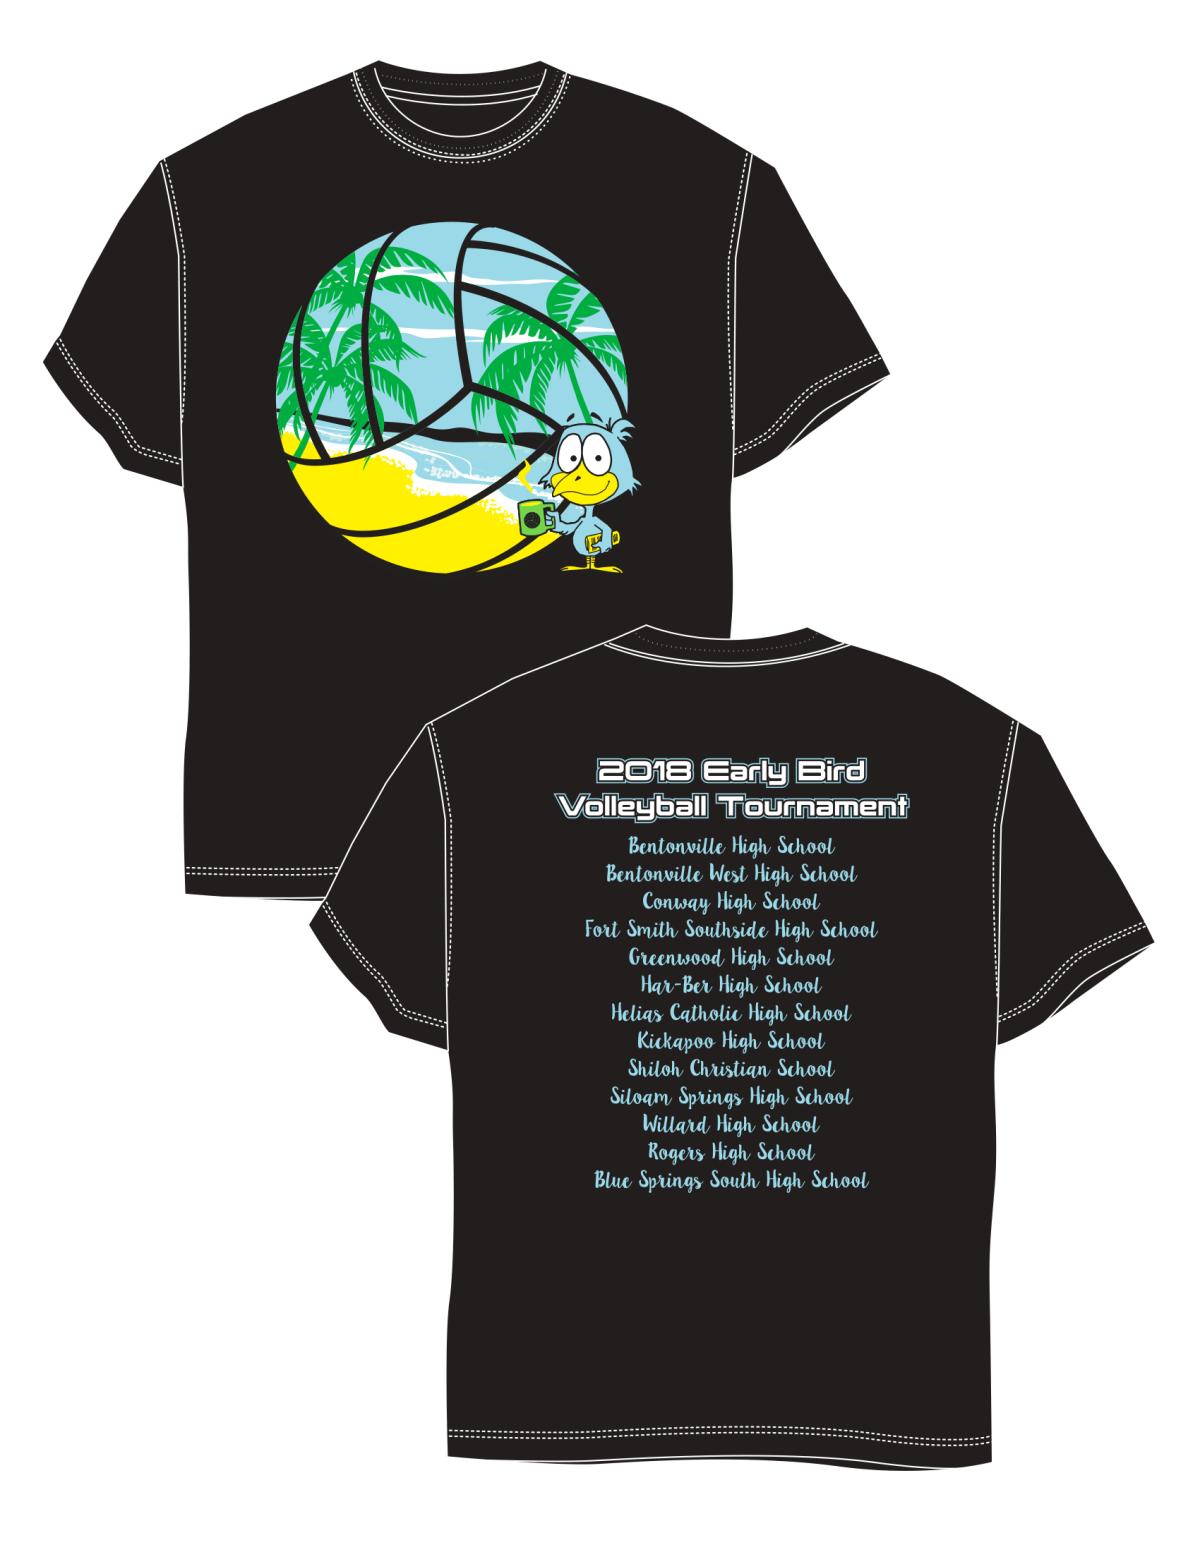 Bentonville High School Volleyball- Early BirdTournament